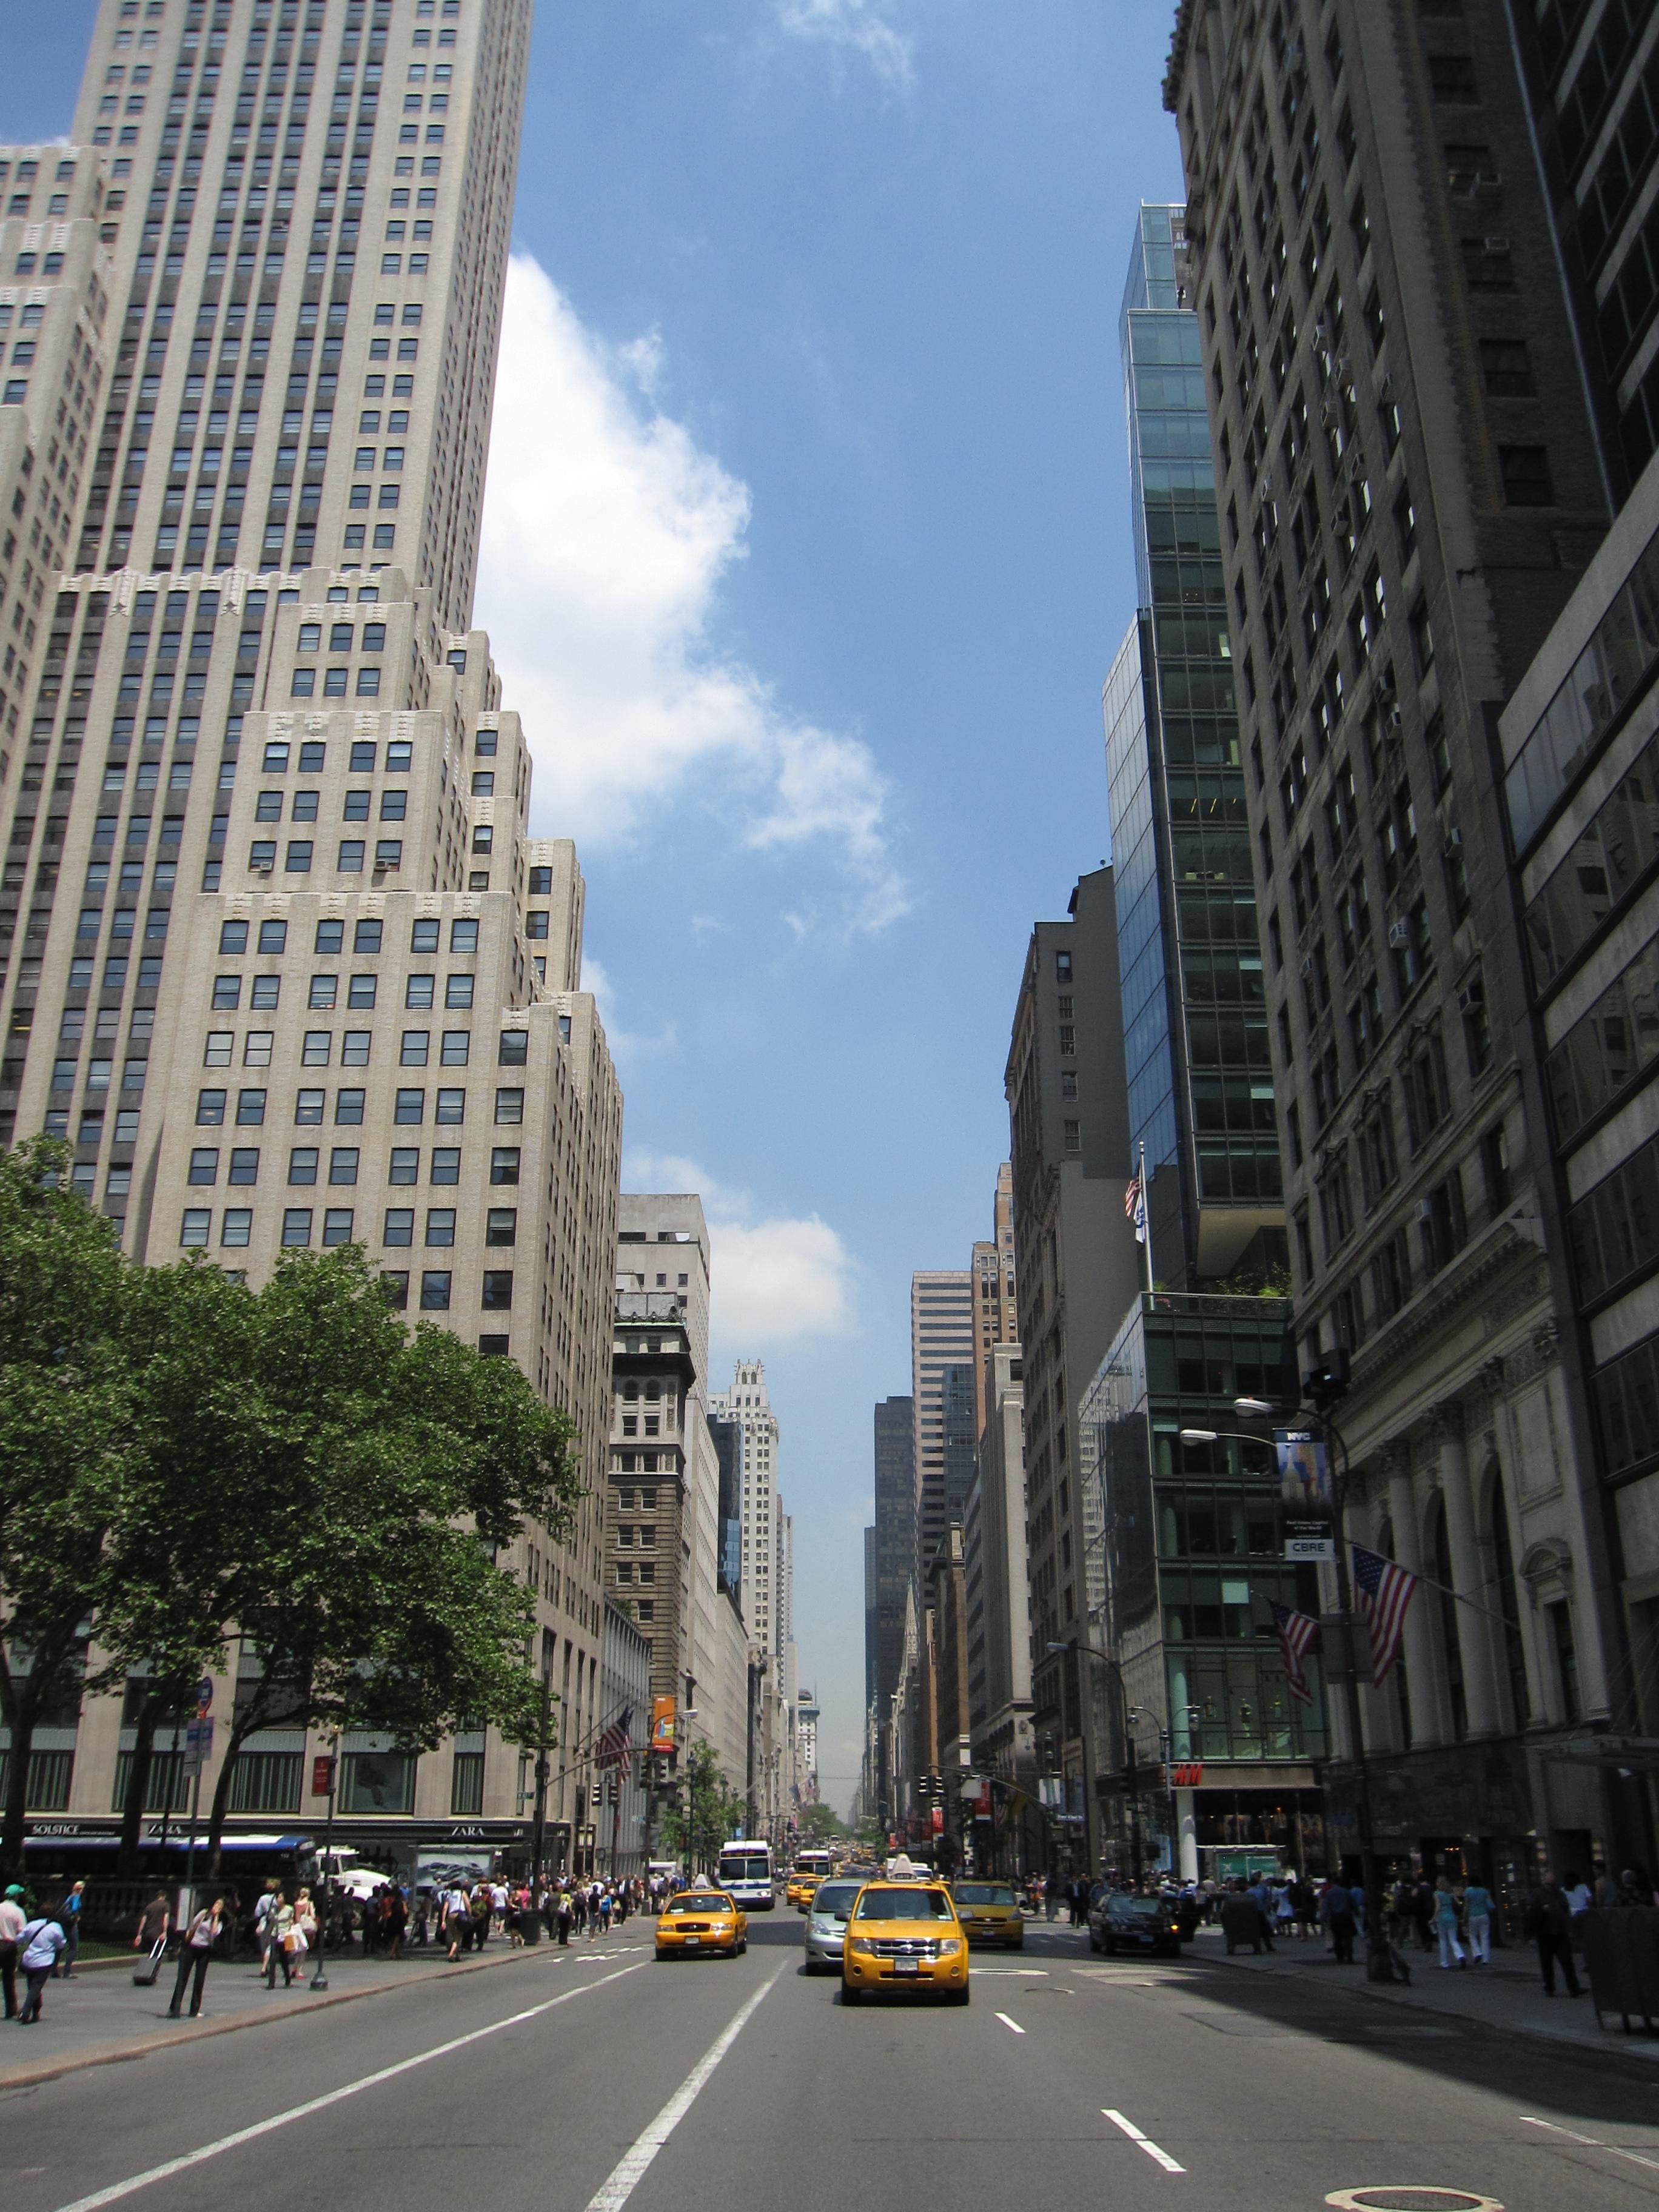 File:5th Avenue 9302.JPG - Wikimedia Commons